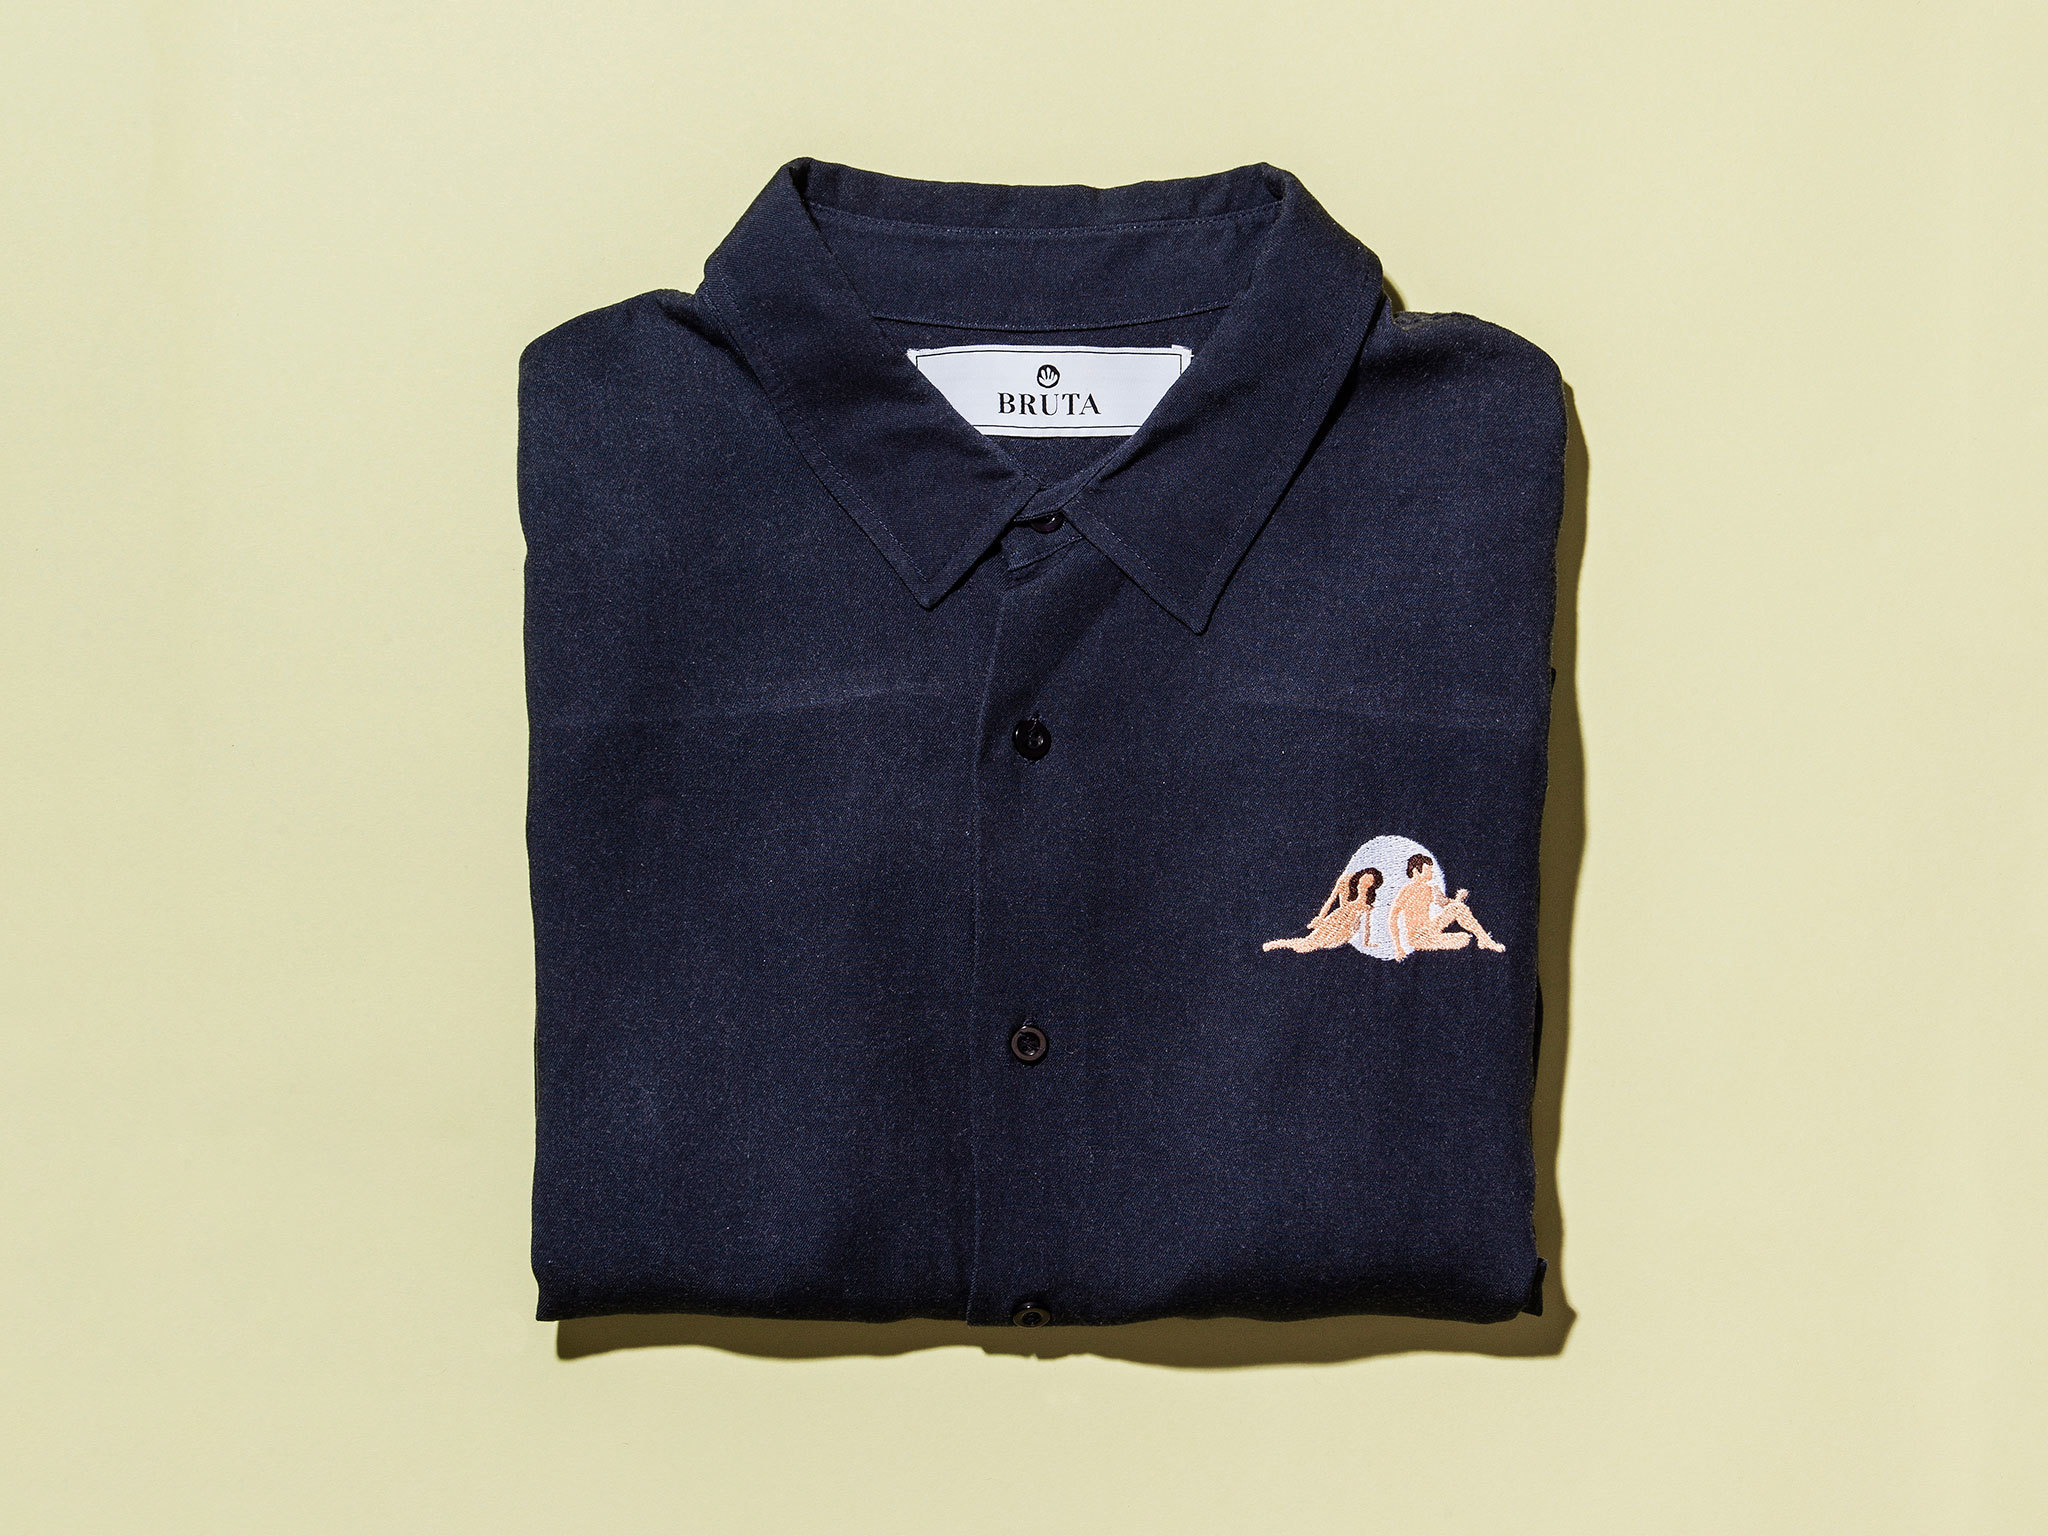 Amor shirt by Bruta